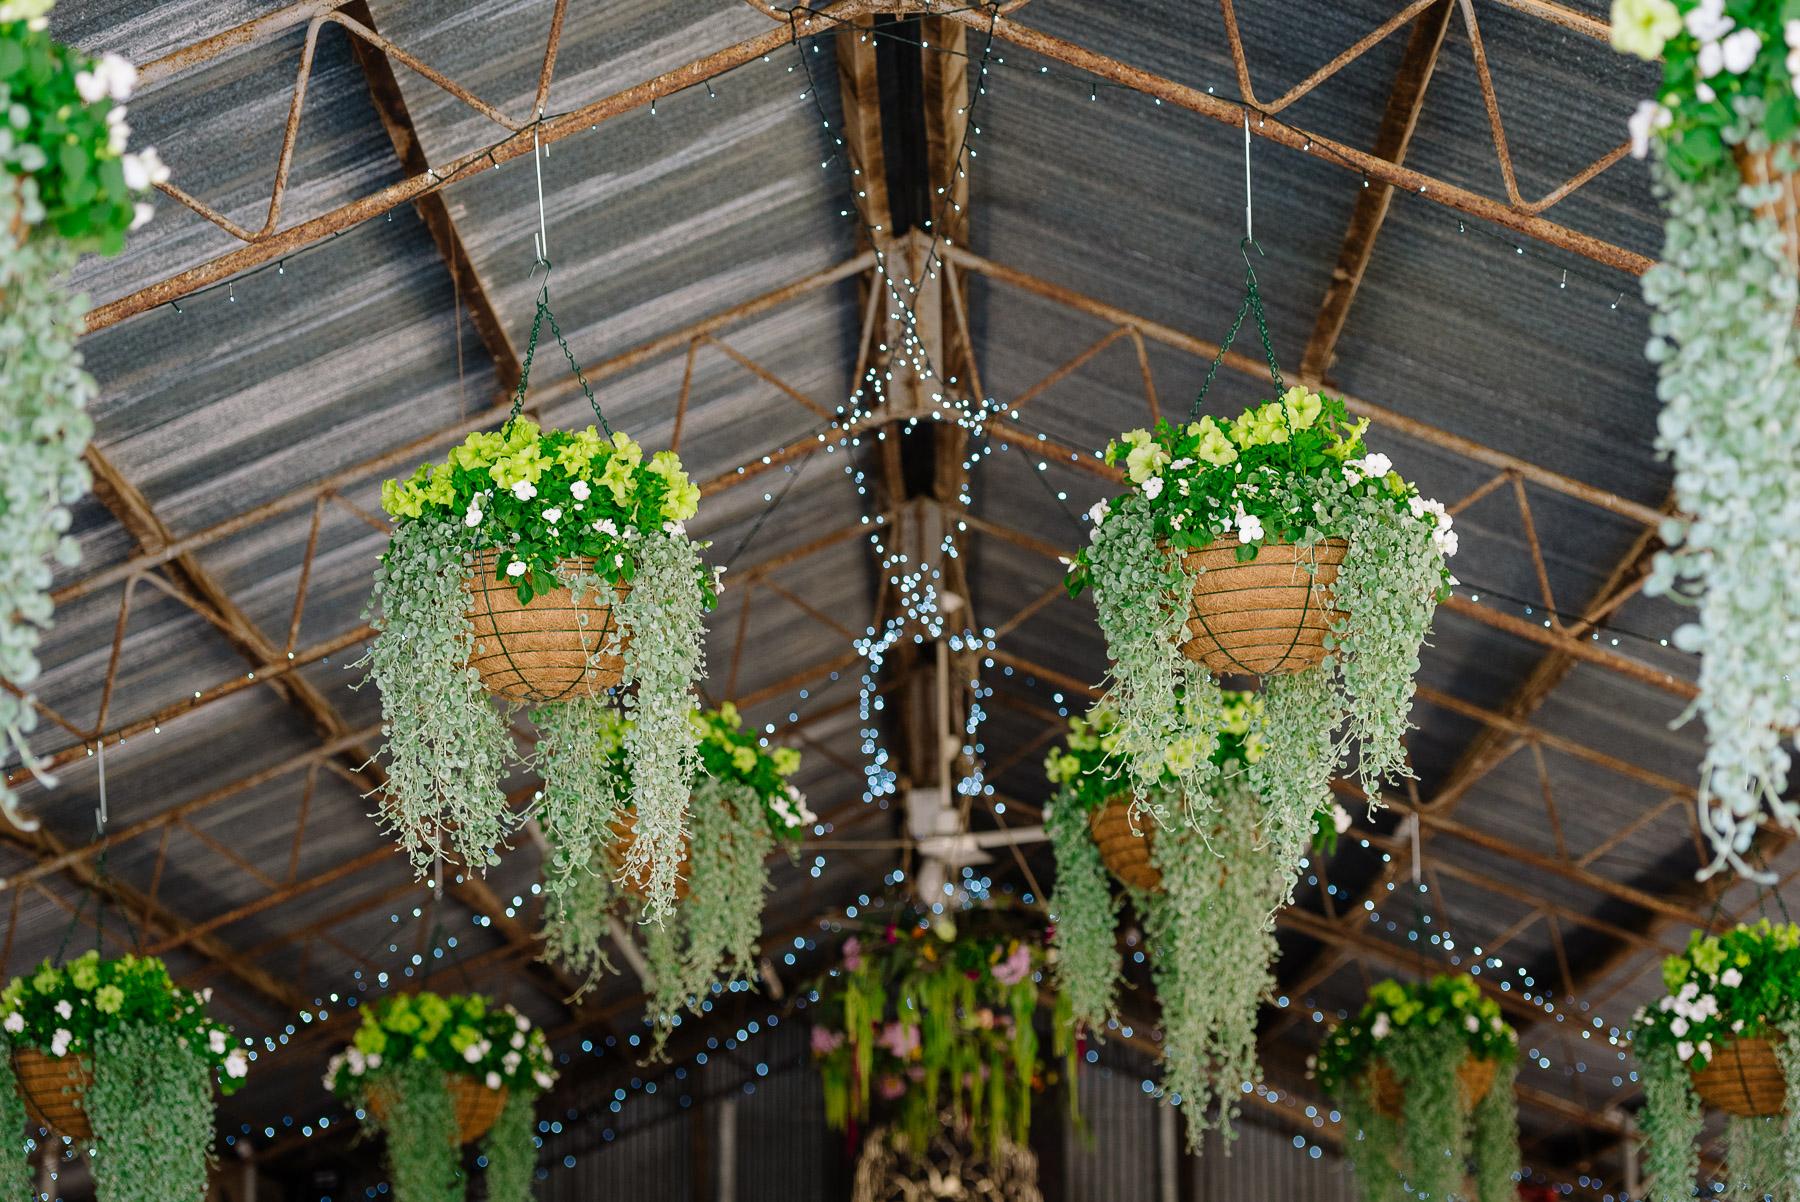 Melissa_and_Kristan_Echuca_Farm_Wedding_New_Years_Eve-34.jpg